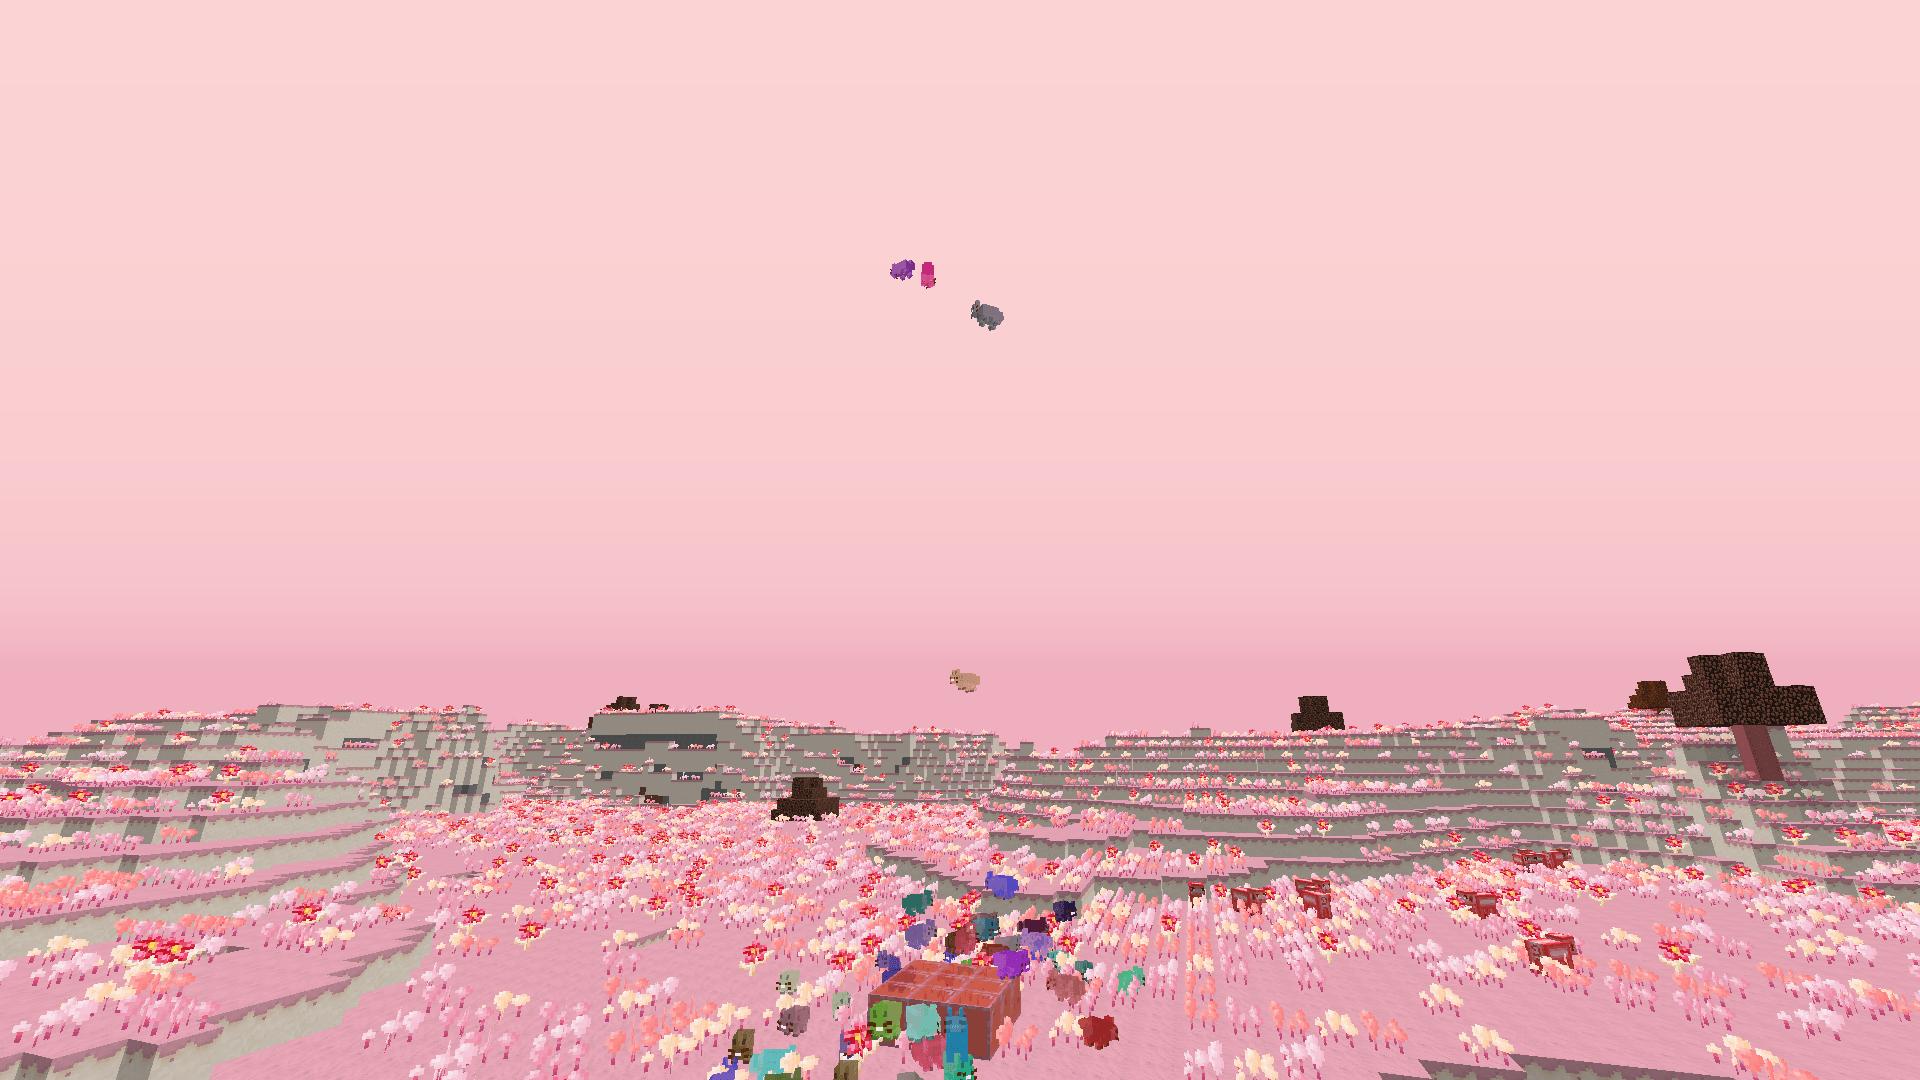 2015-02-23_00.38.48